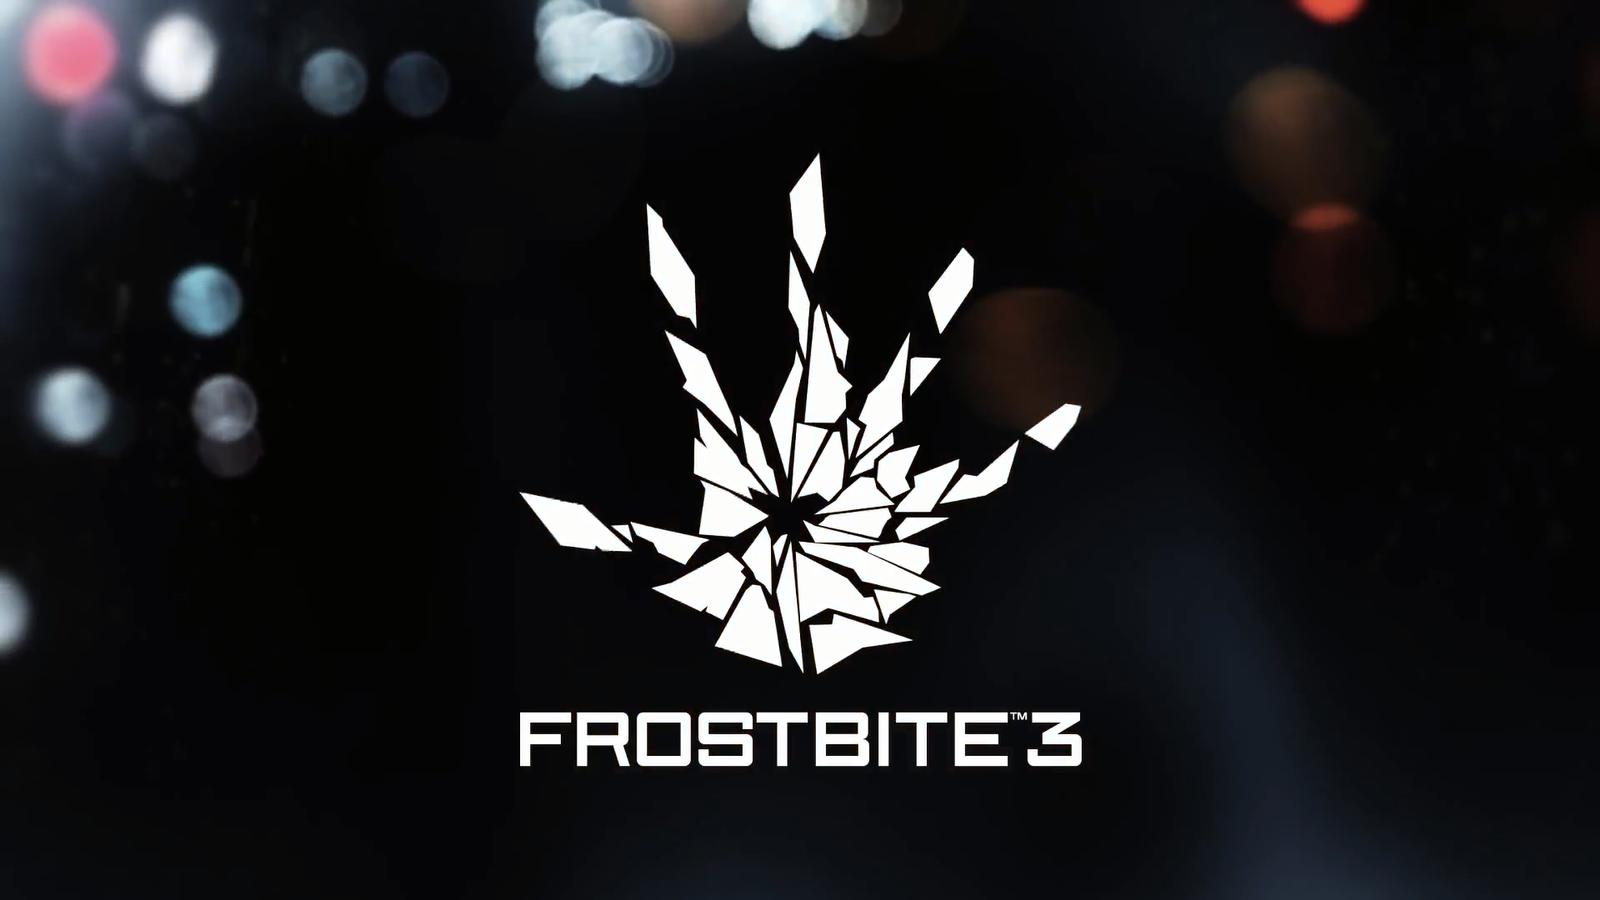 Battlefield 4: Frostbite 3 Feature Trailer   Battlefield